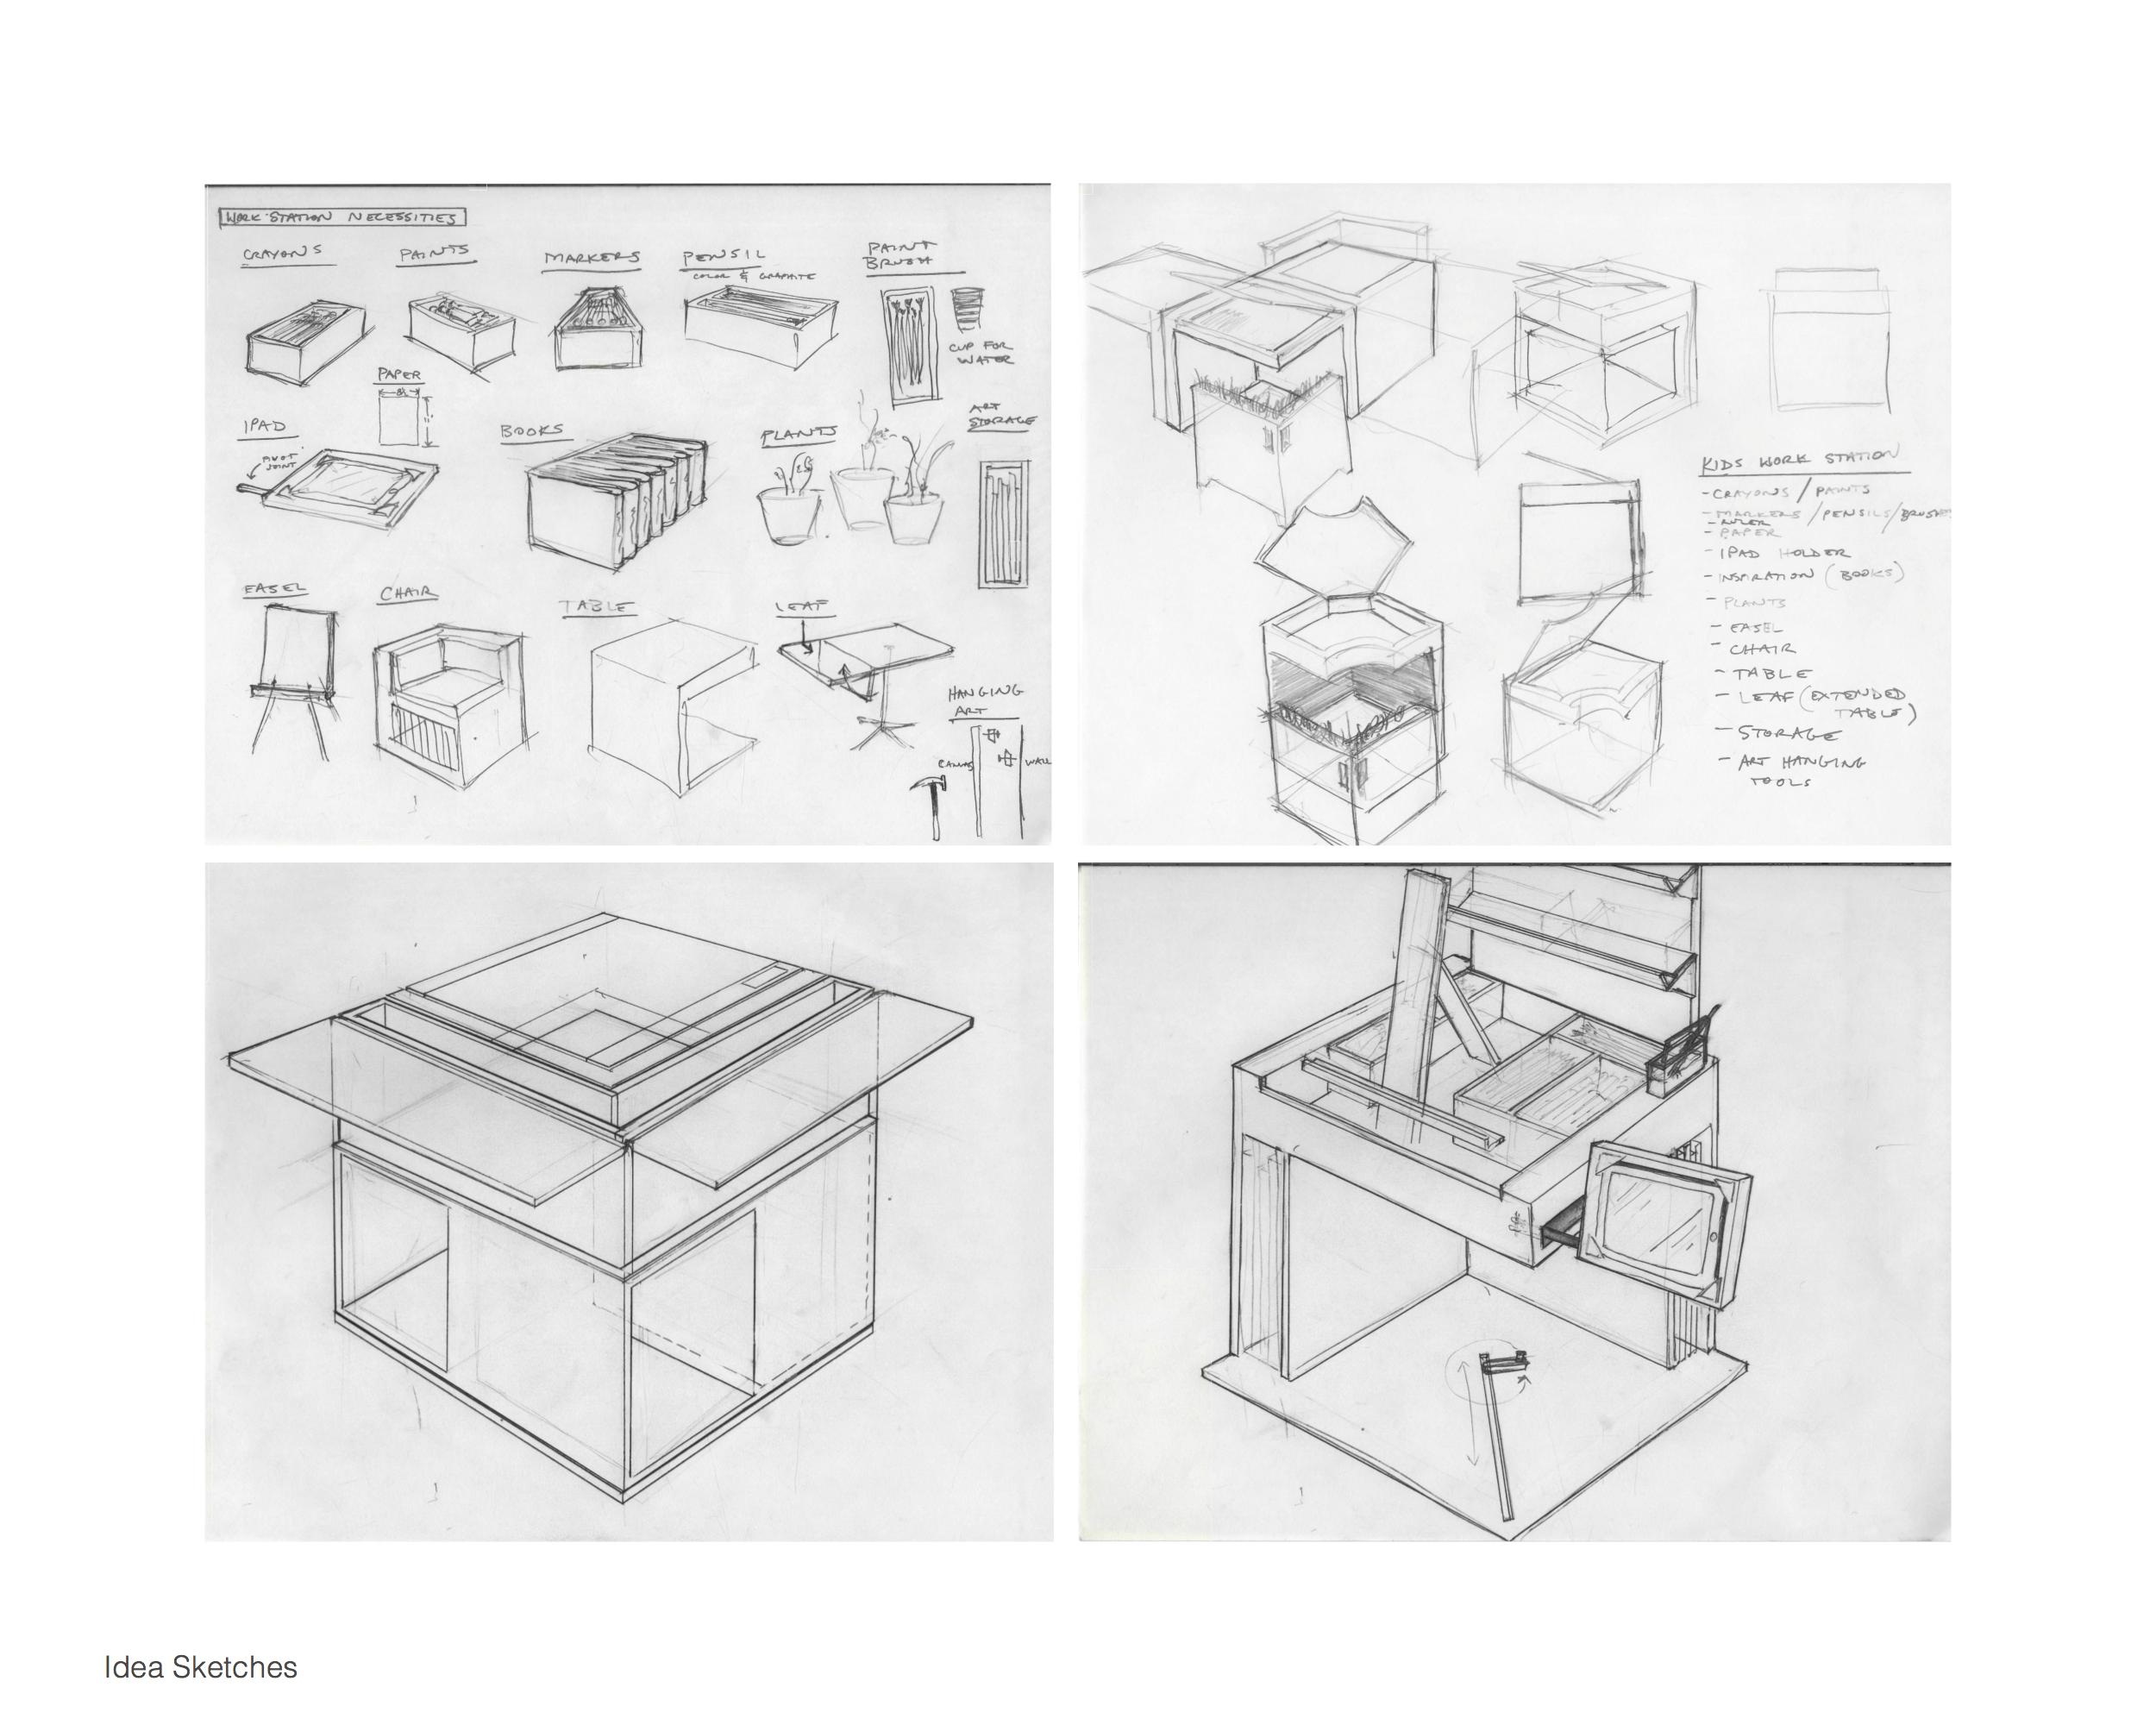 DW_DesignPorfolio&Resume_ForWeb (dragged) 3.png